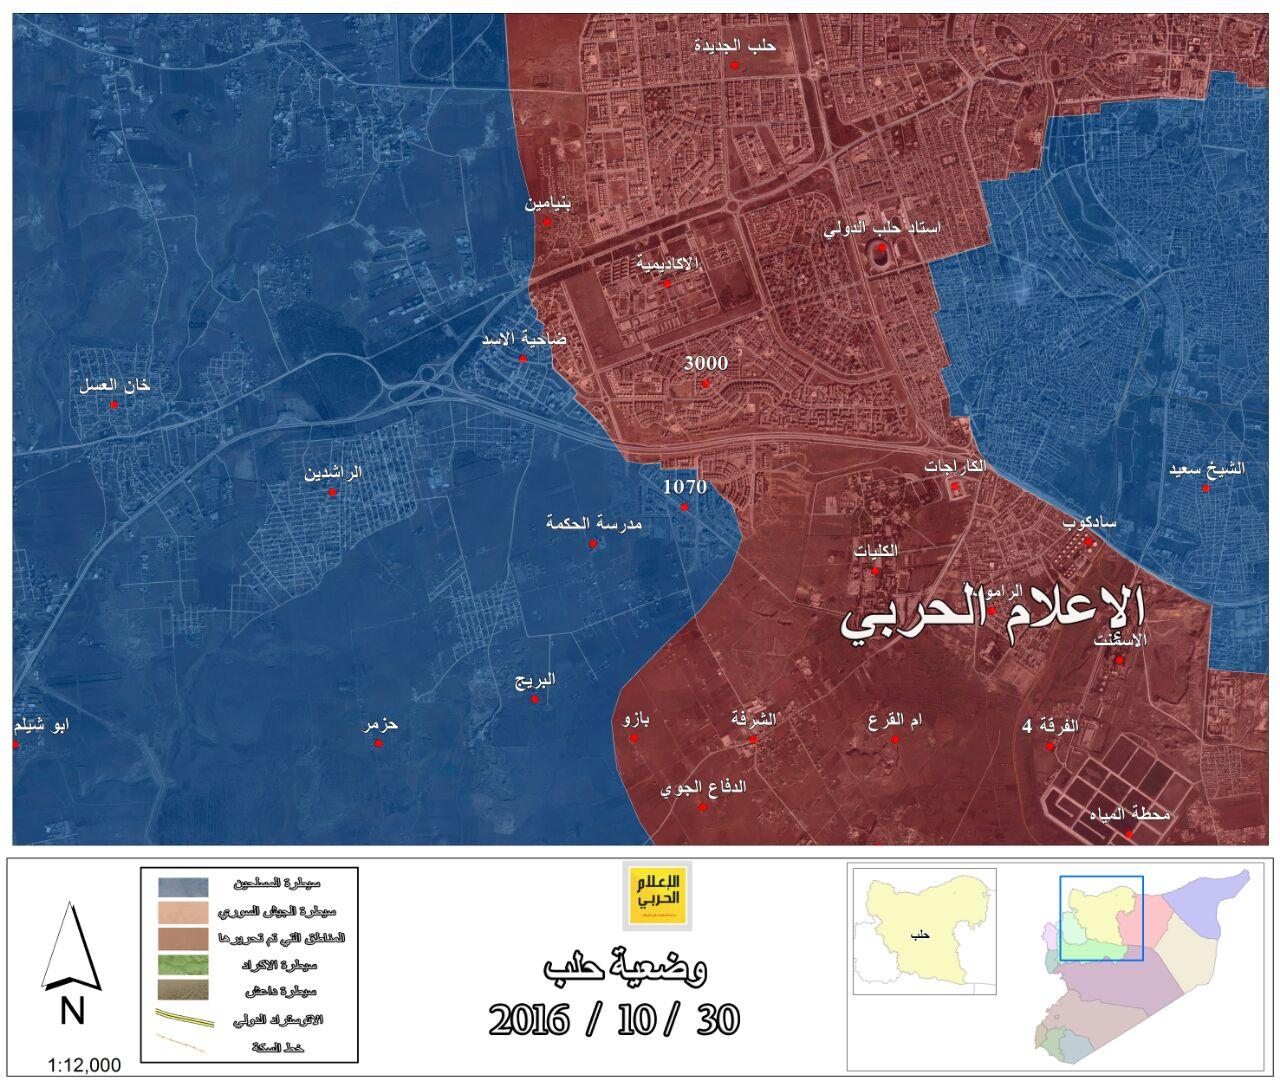 syria-halab-military30-10-2016